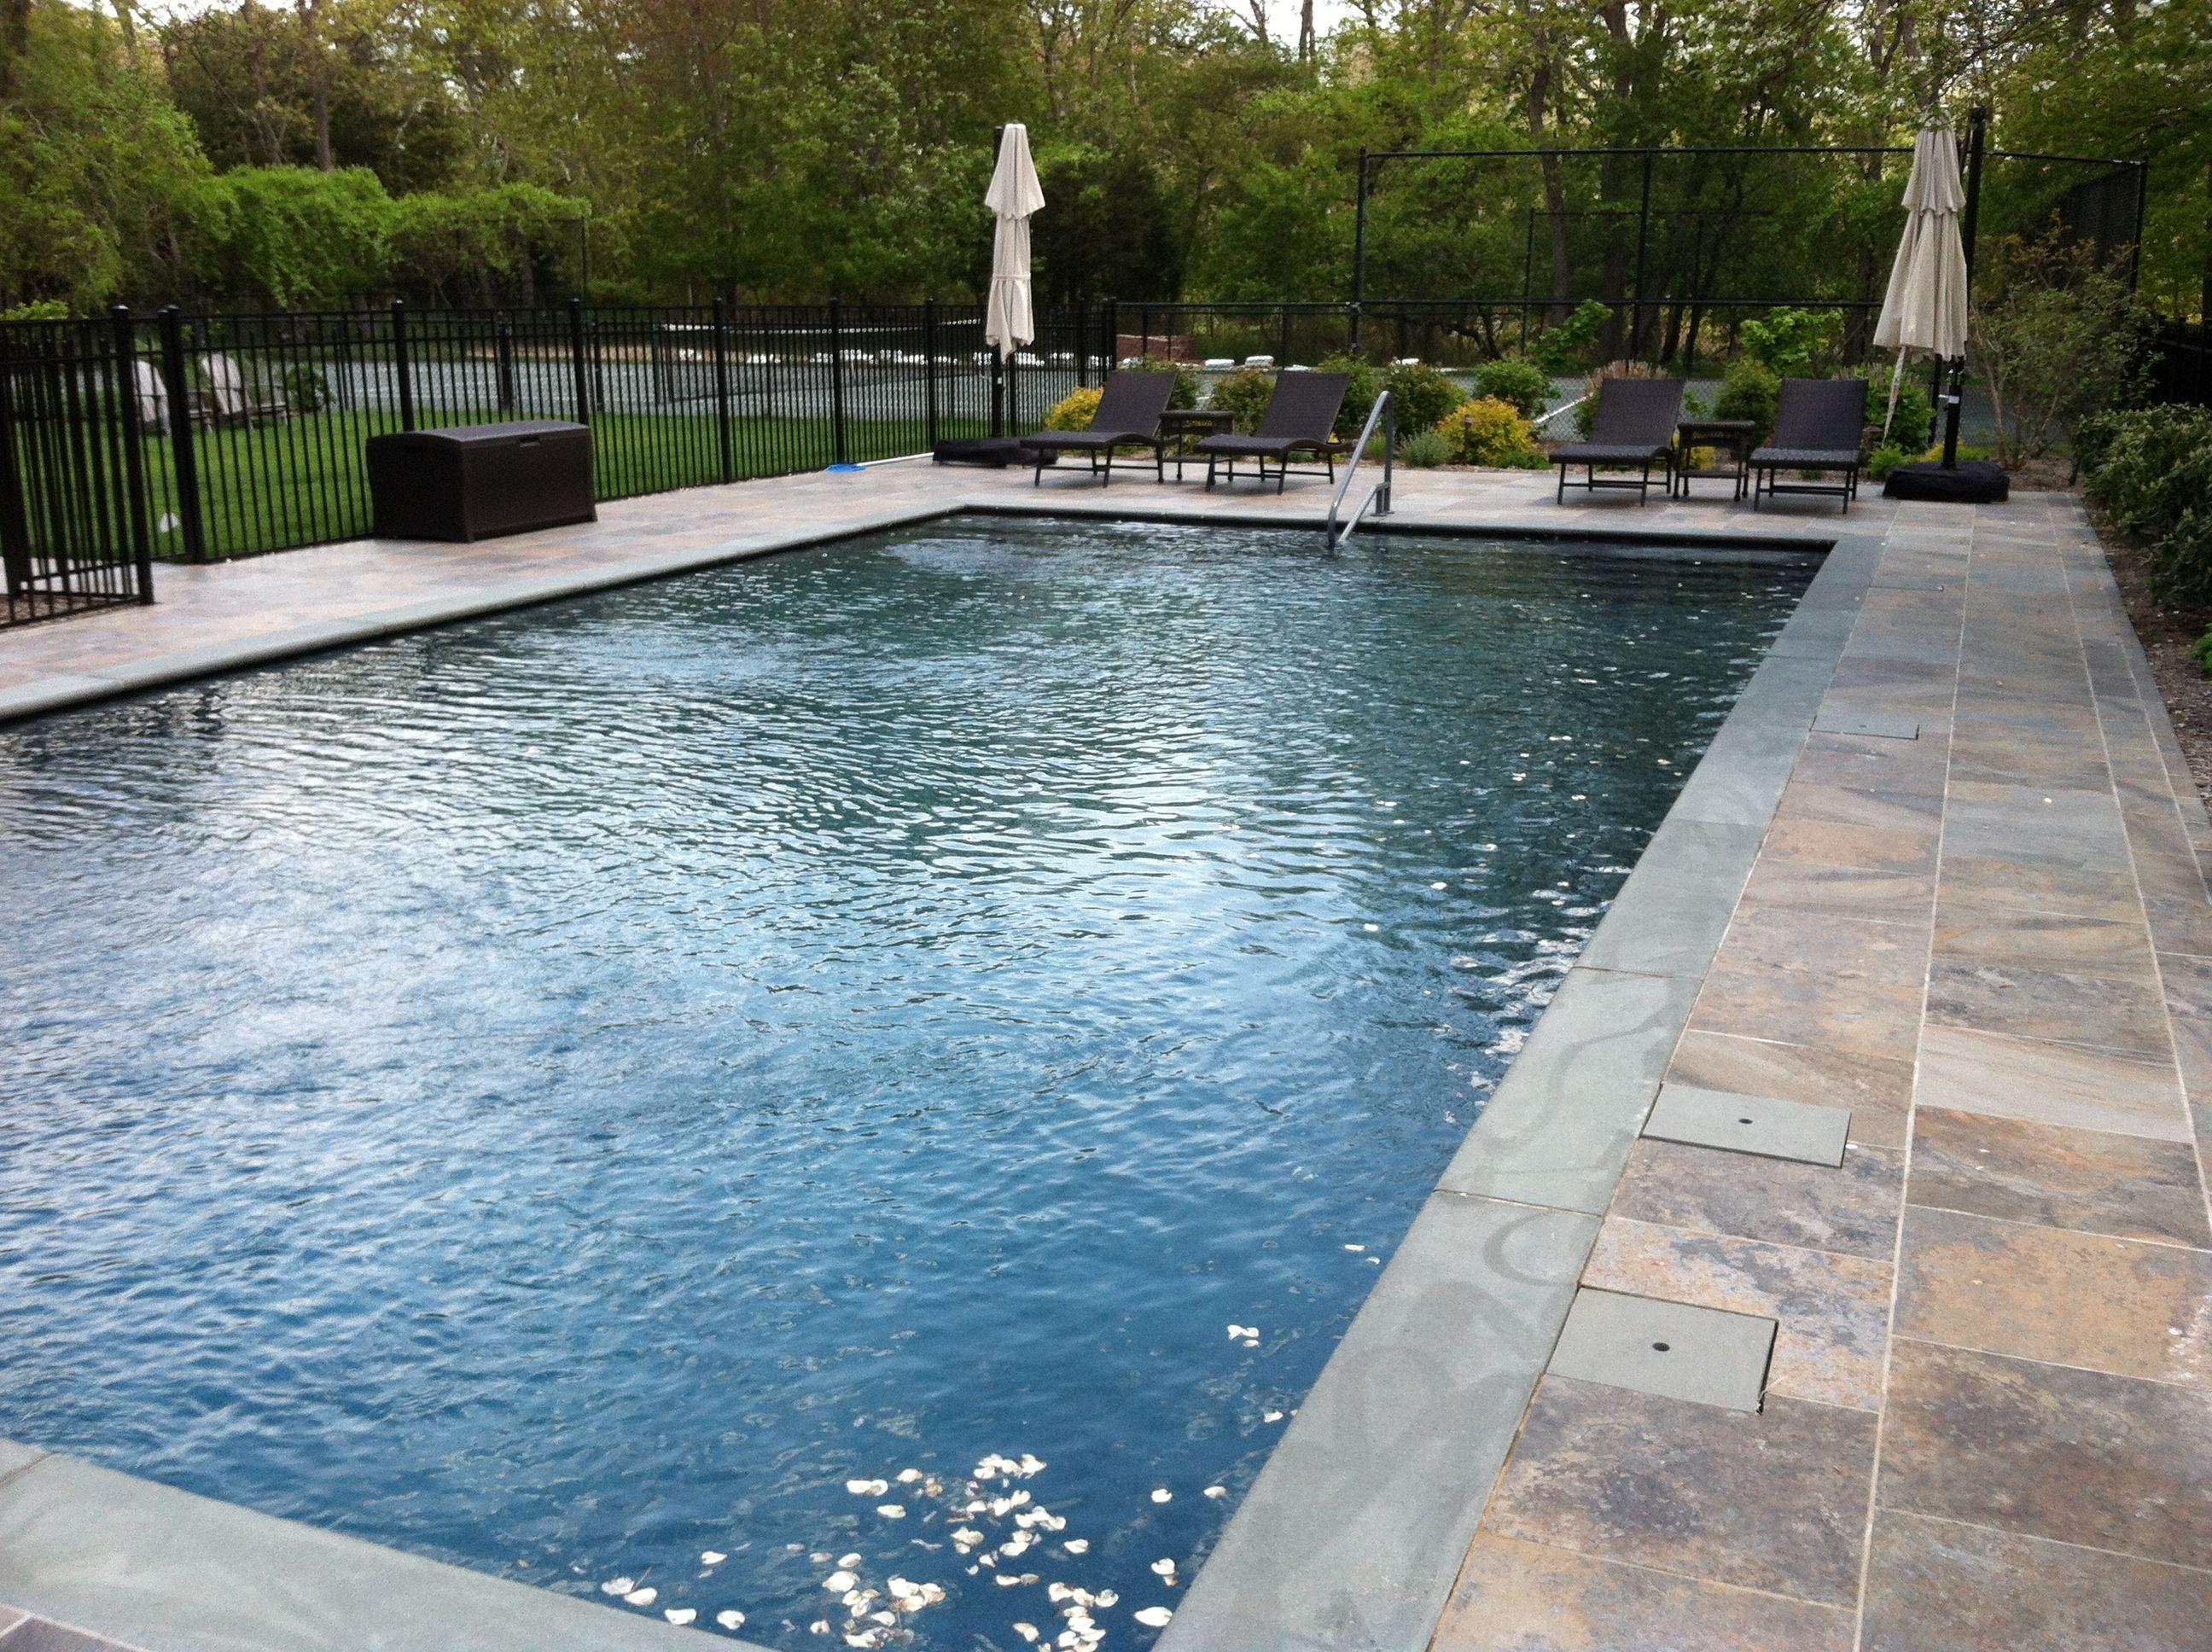 20 X 40 Swimming Pool Google Search Rectangle Swimming Pools Inground Pool Designs Gunite Swimming Pool